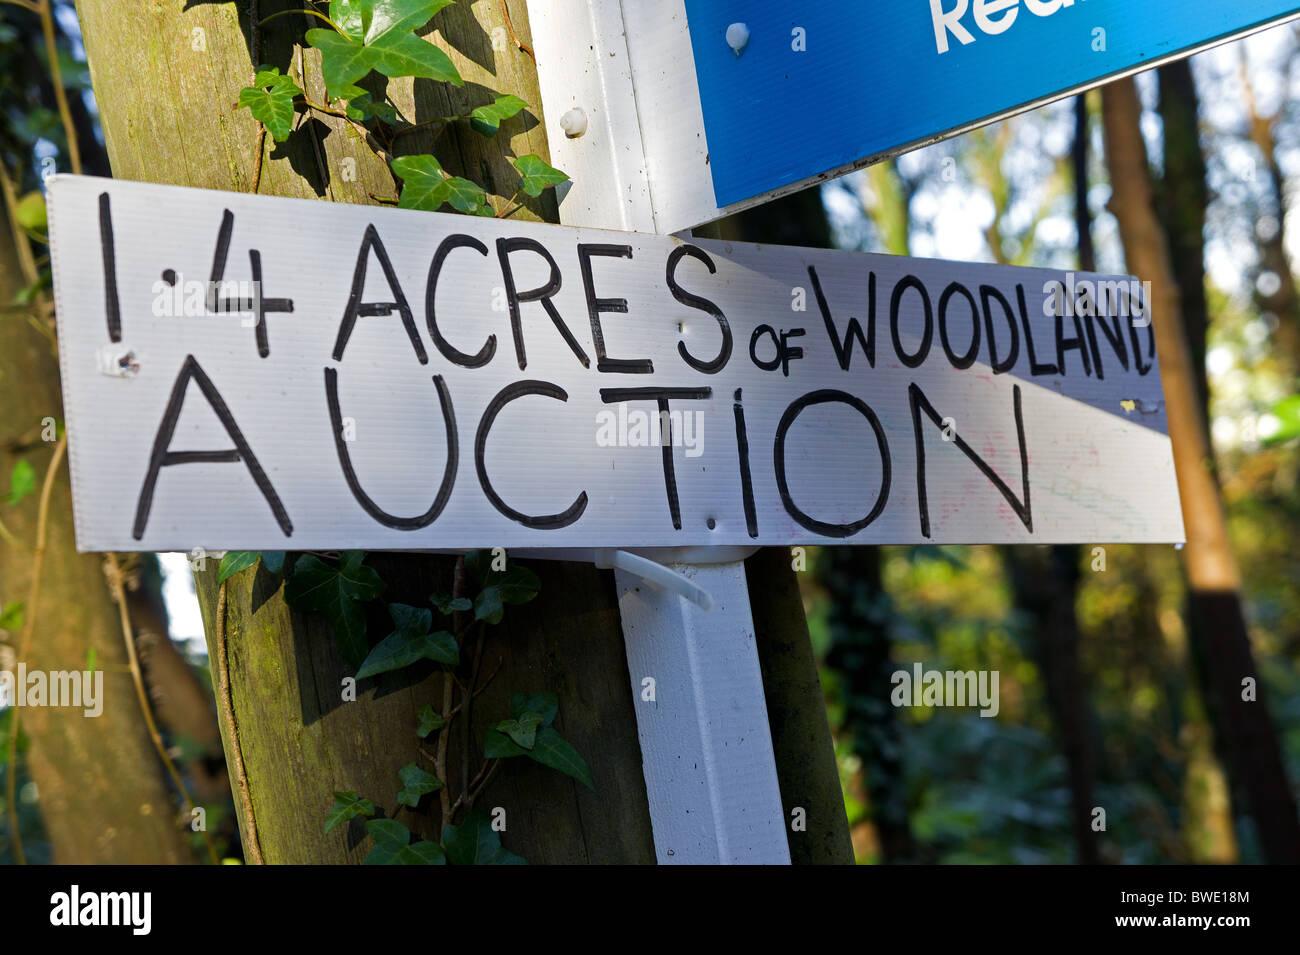 woodland up for auction in hampshire, england, uk - Stock Image